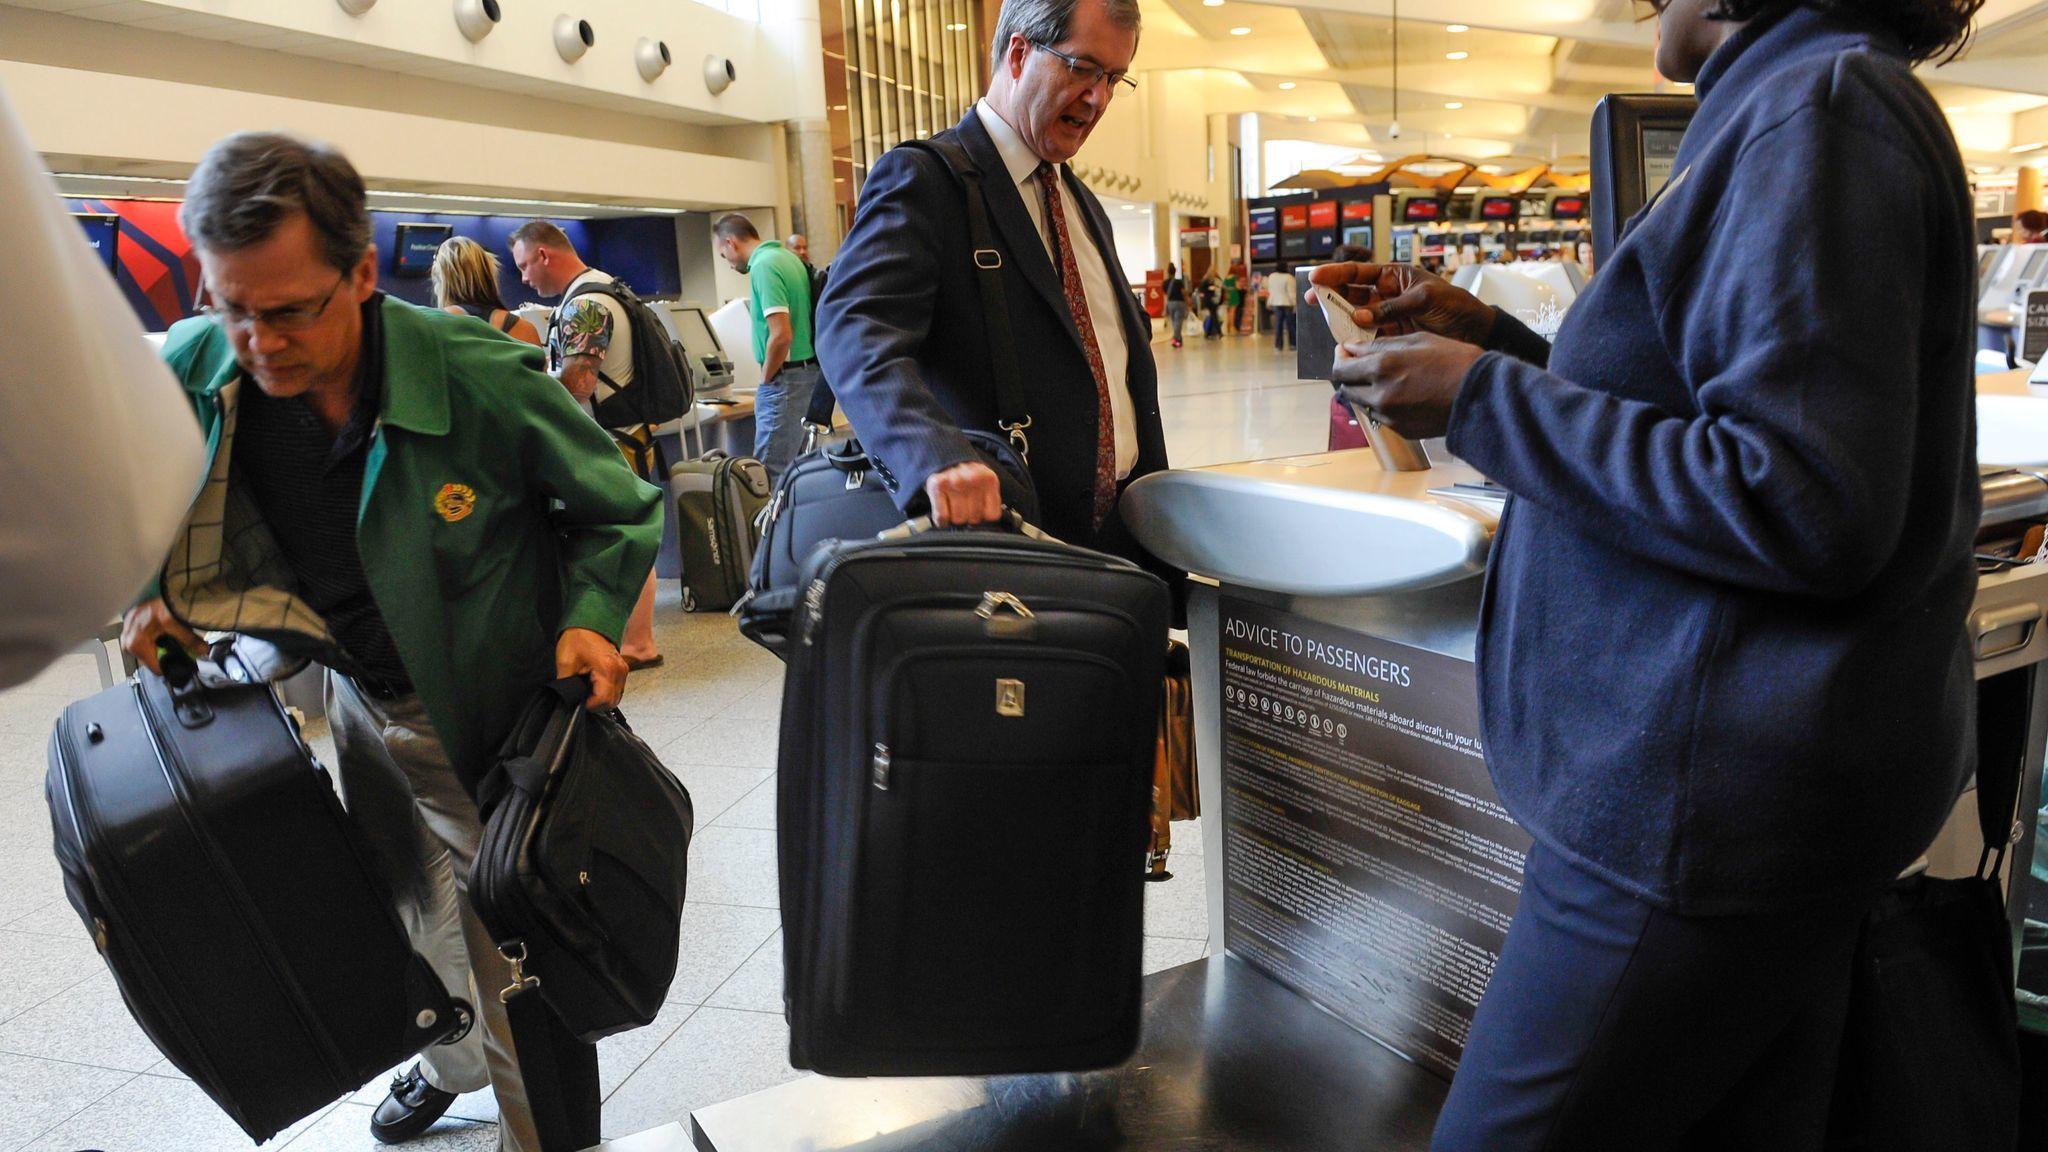 Passengers check in luggage at the Delta counter at Hartsfield-Jackson Atlanta International Airport.